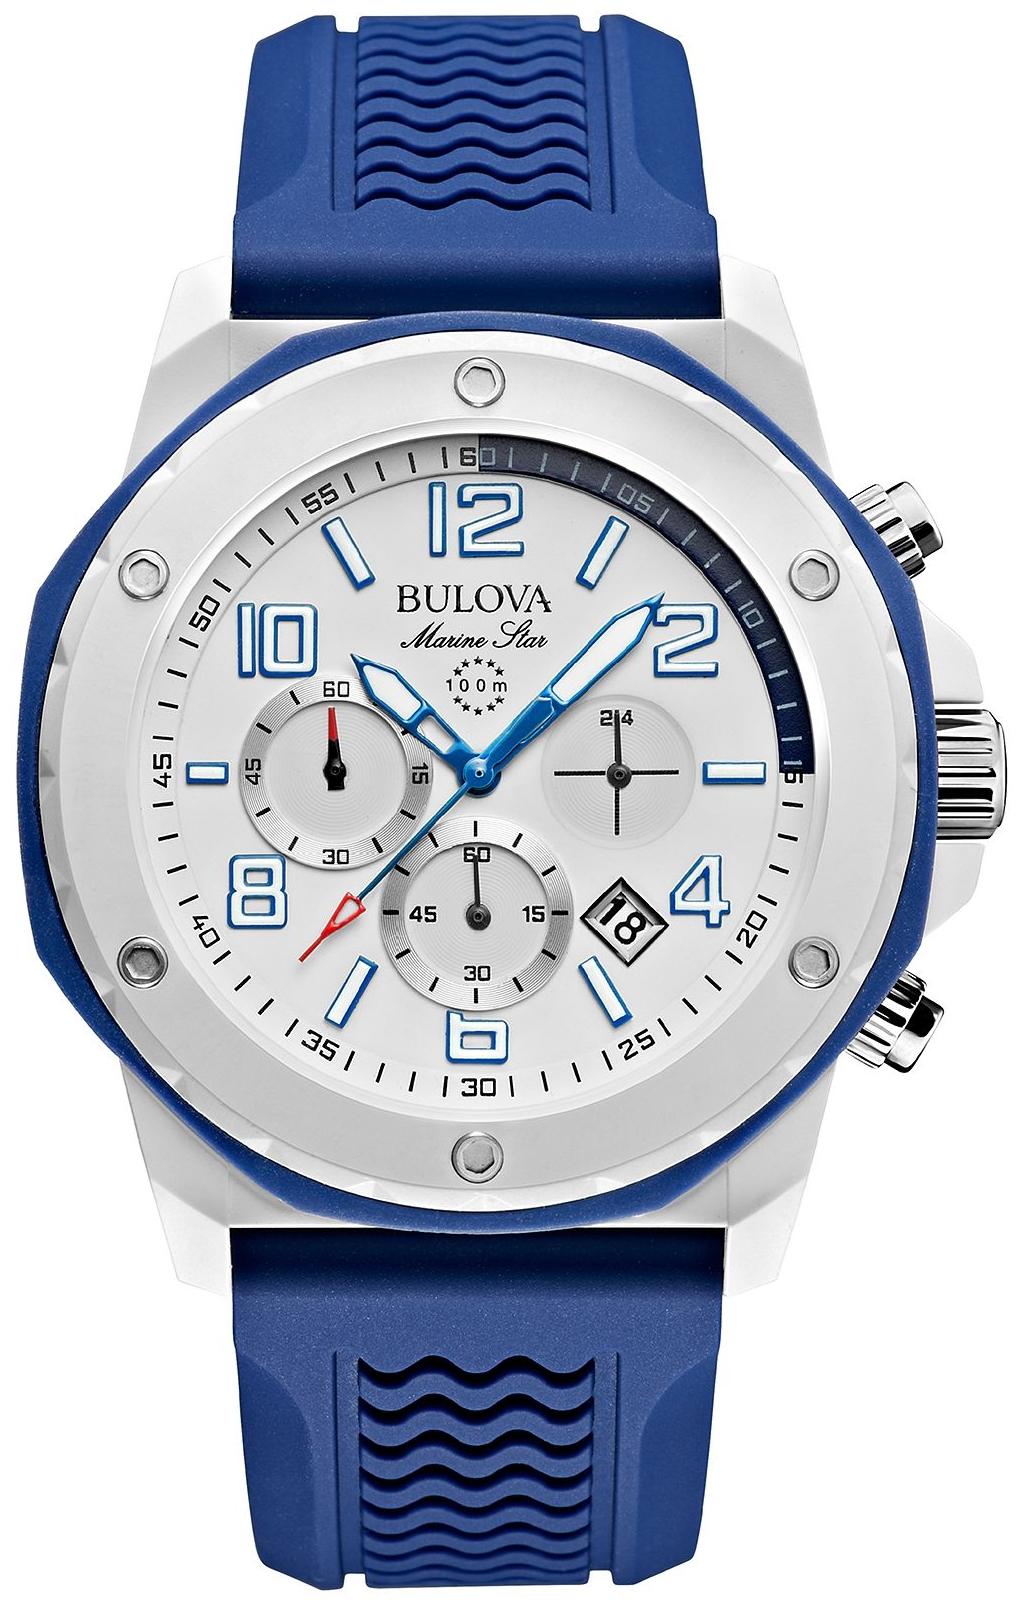 Bulova Men's Blue Silicone Watch 44mm